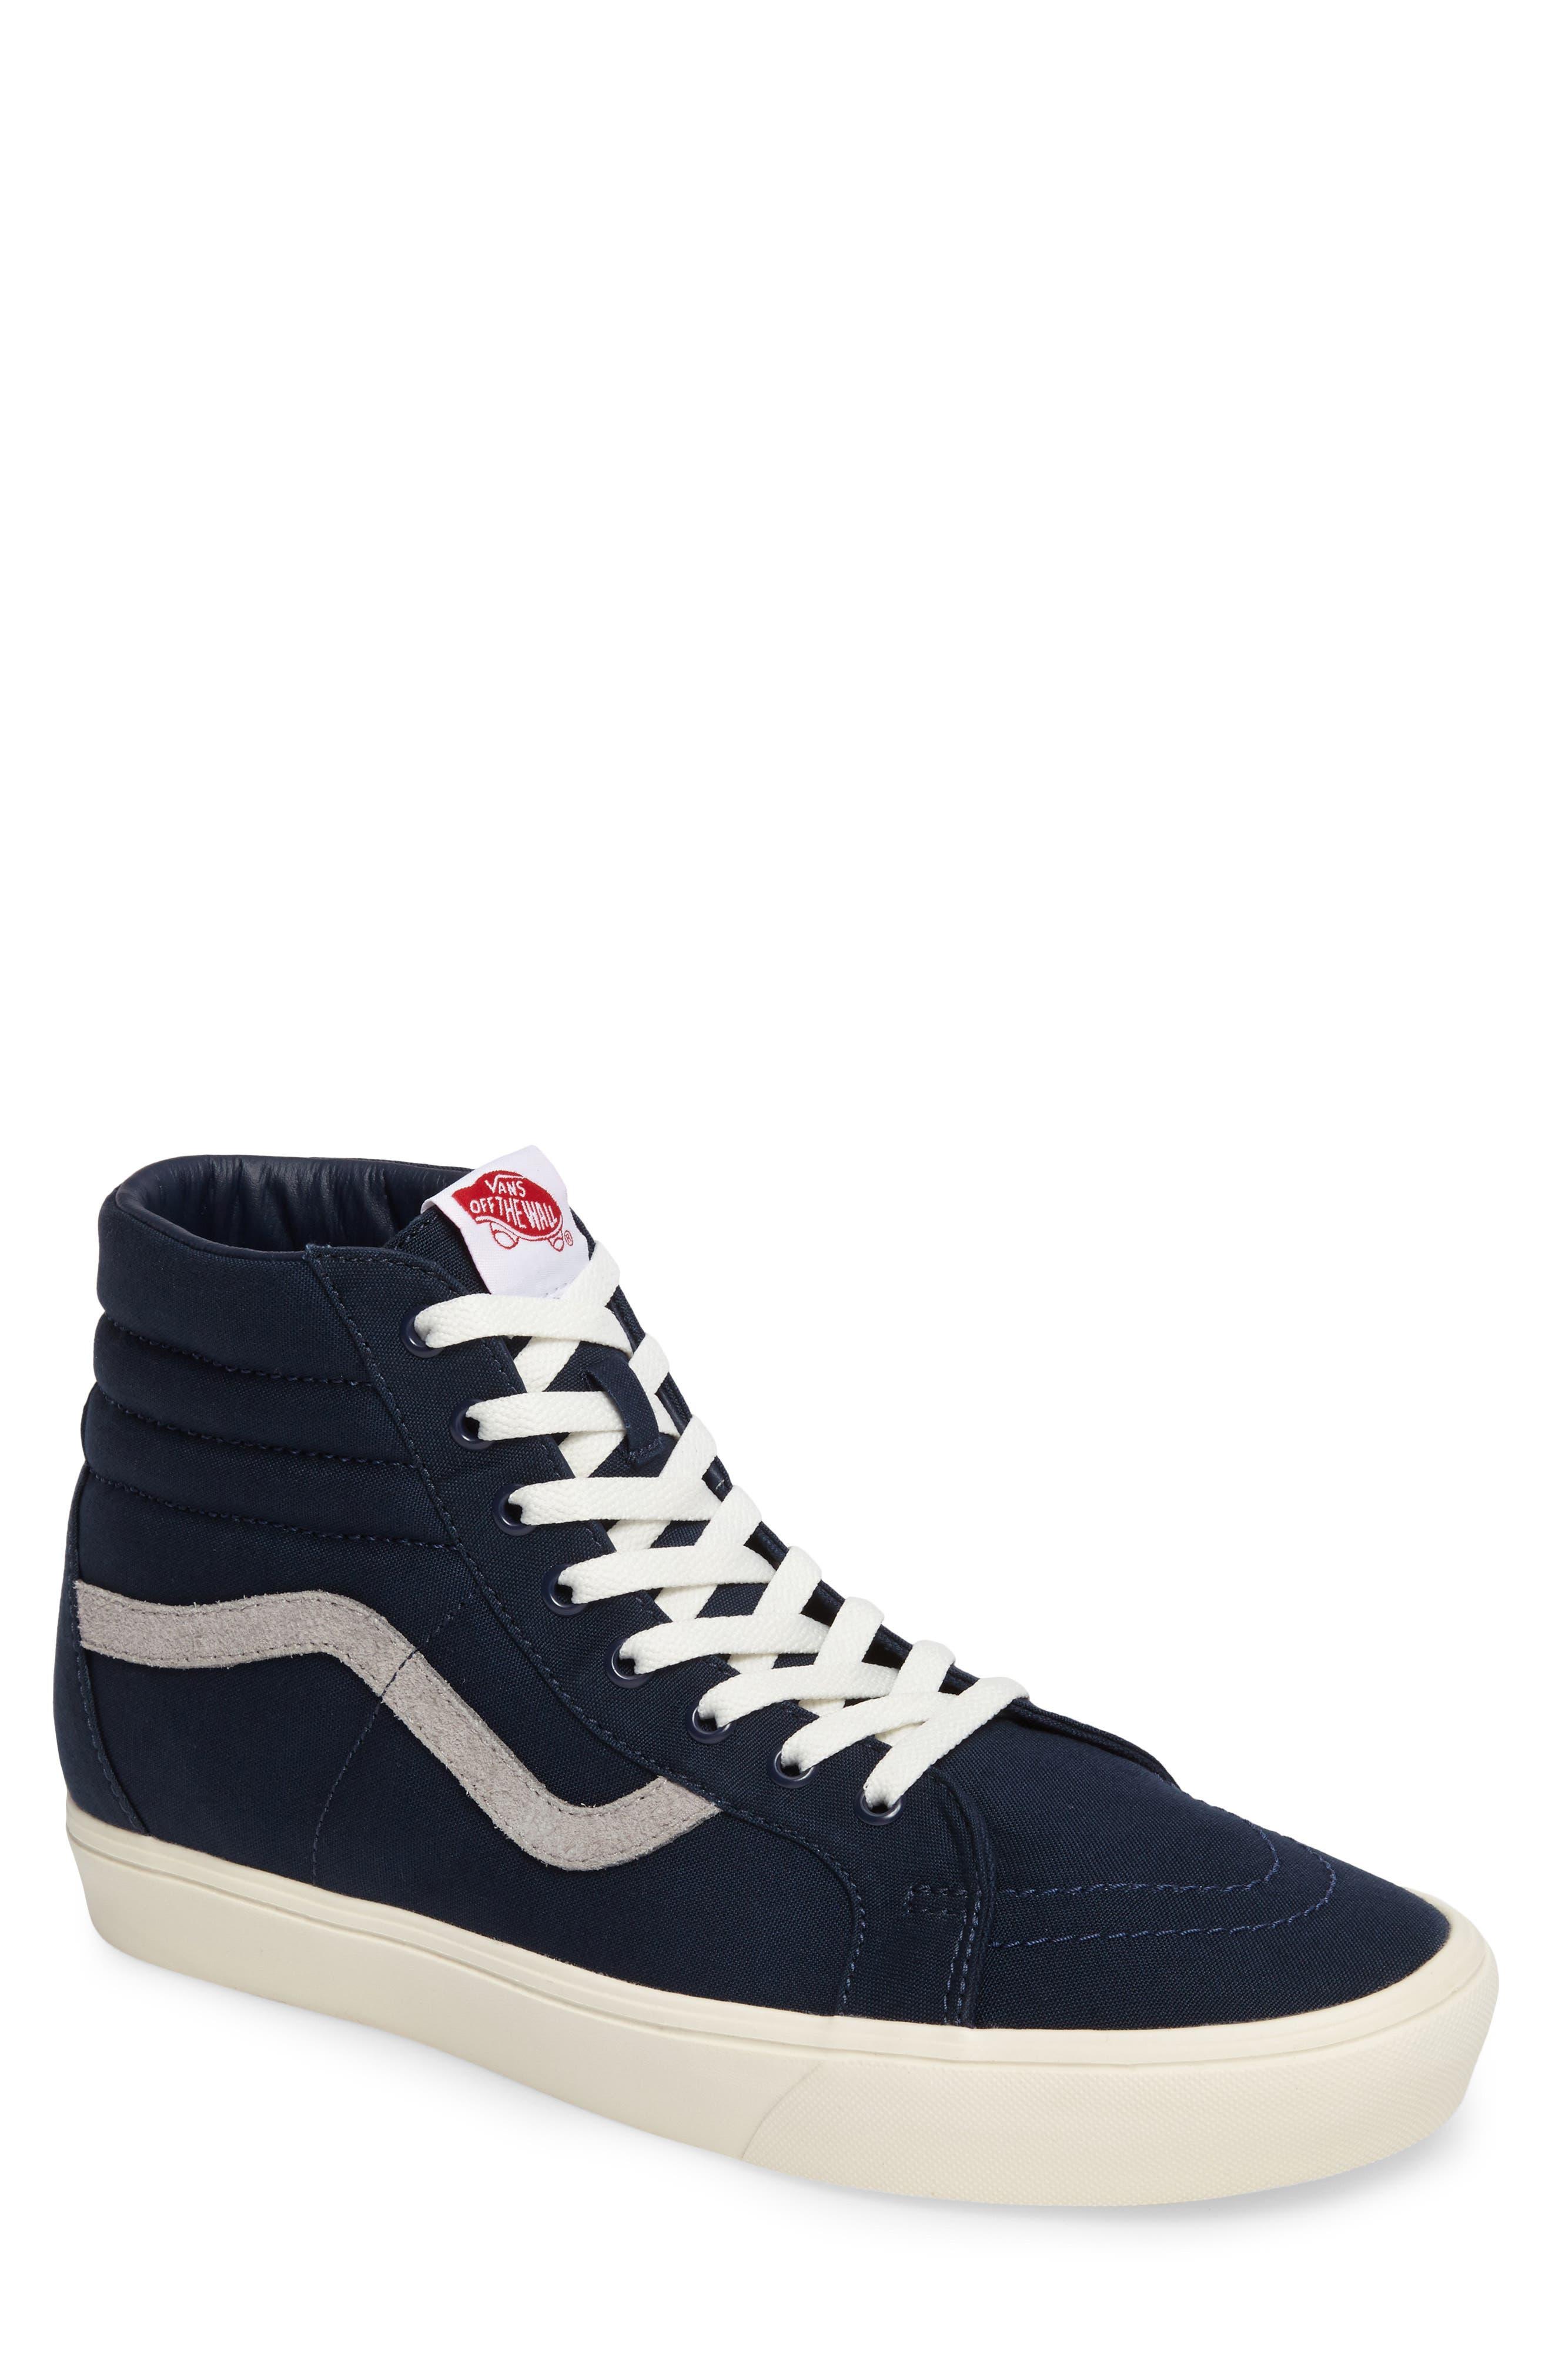 Sk80-Hi Reissue Lite Sneaker,                             Main thumbnail 1, color,                             Dress Blues/Marshmallow Canvas